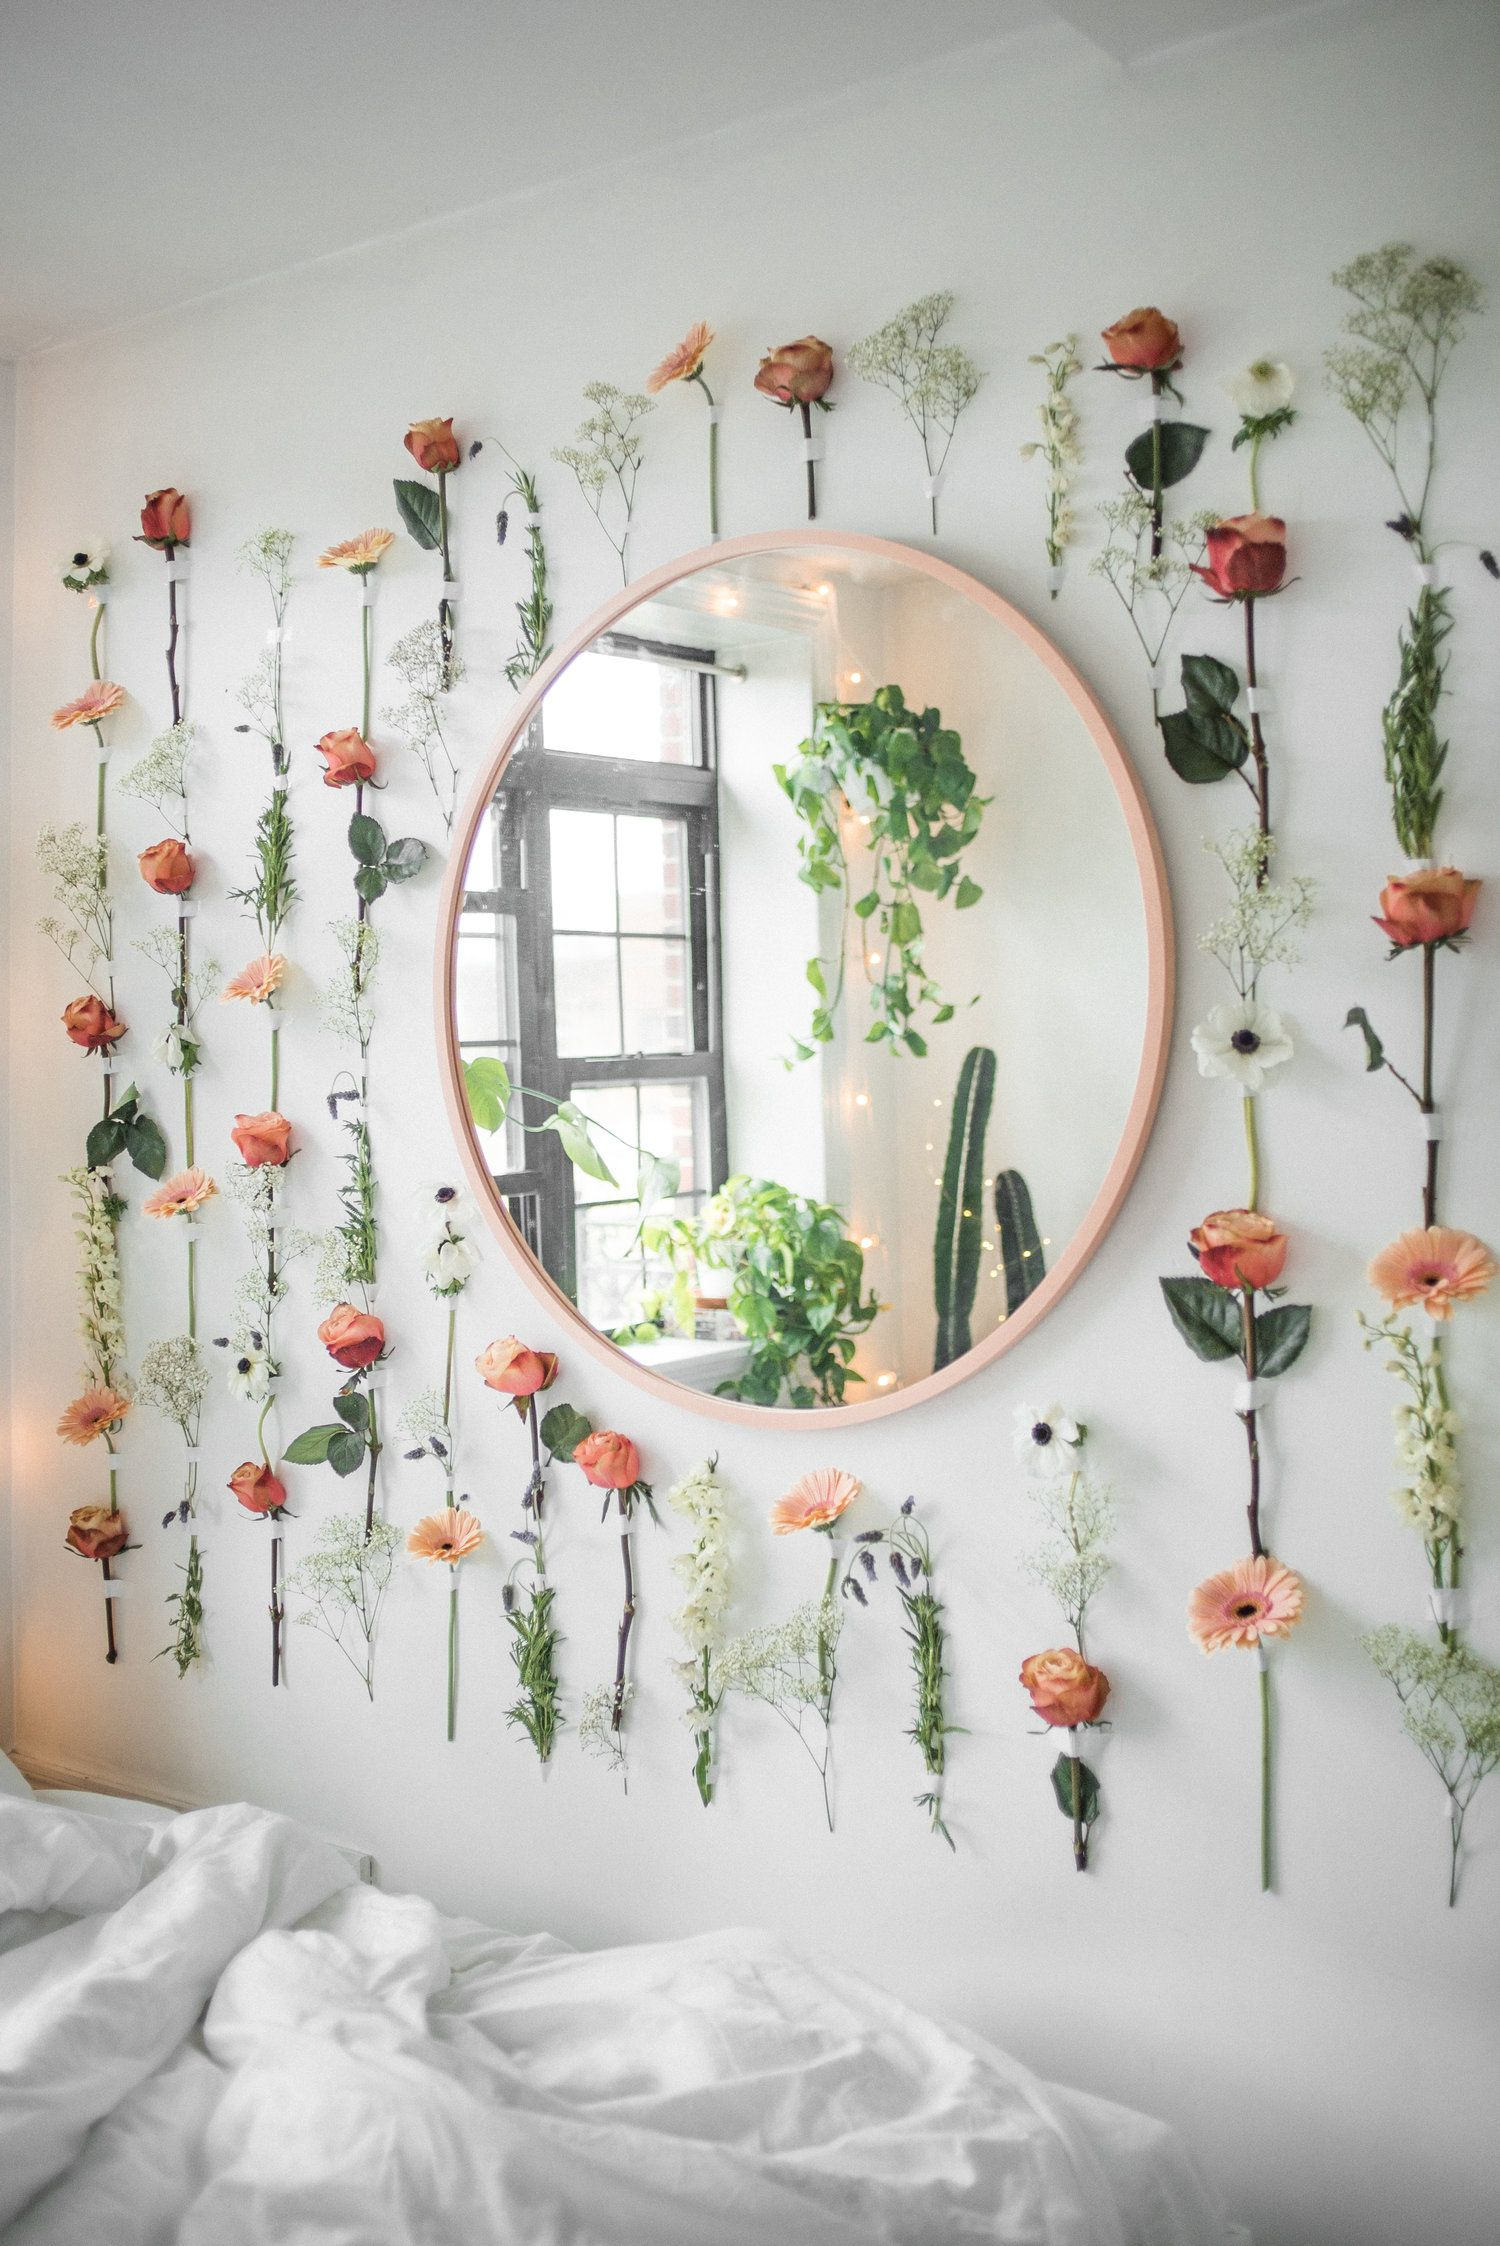 Diy Flower Wall Delaney Poli In 2020 Wall Bedroom Diy Diy Flower Wall Diy Room Decor